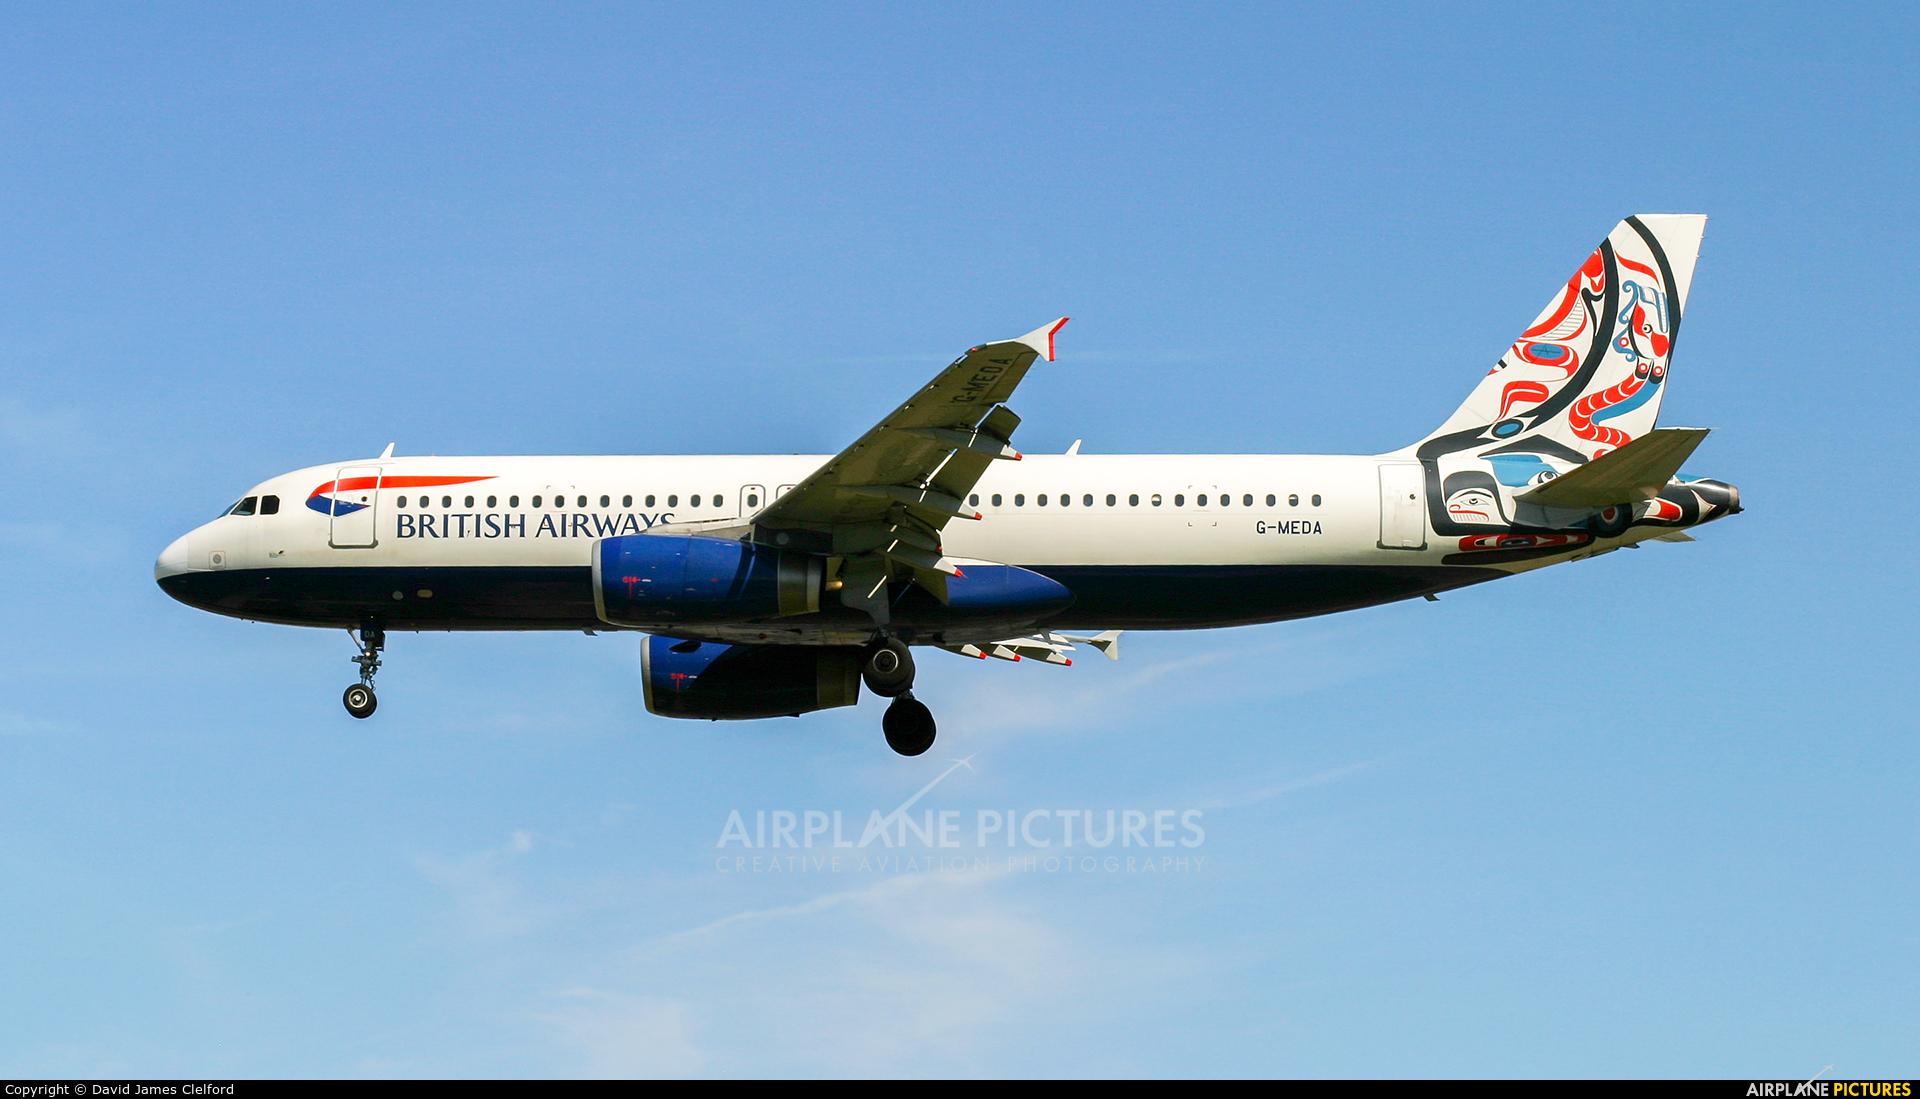 British Airways G-MEDA aircraft at London - Heathrow